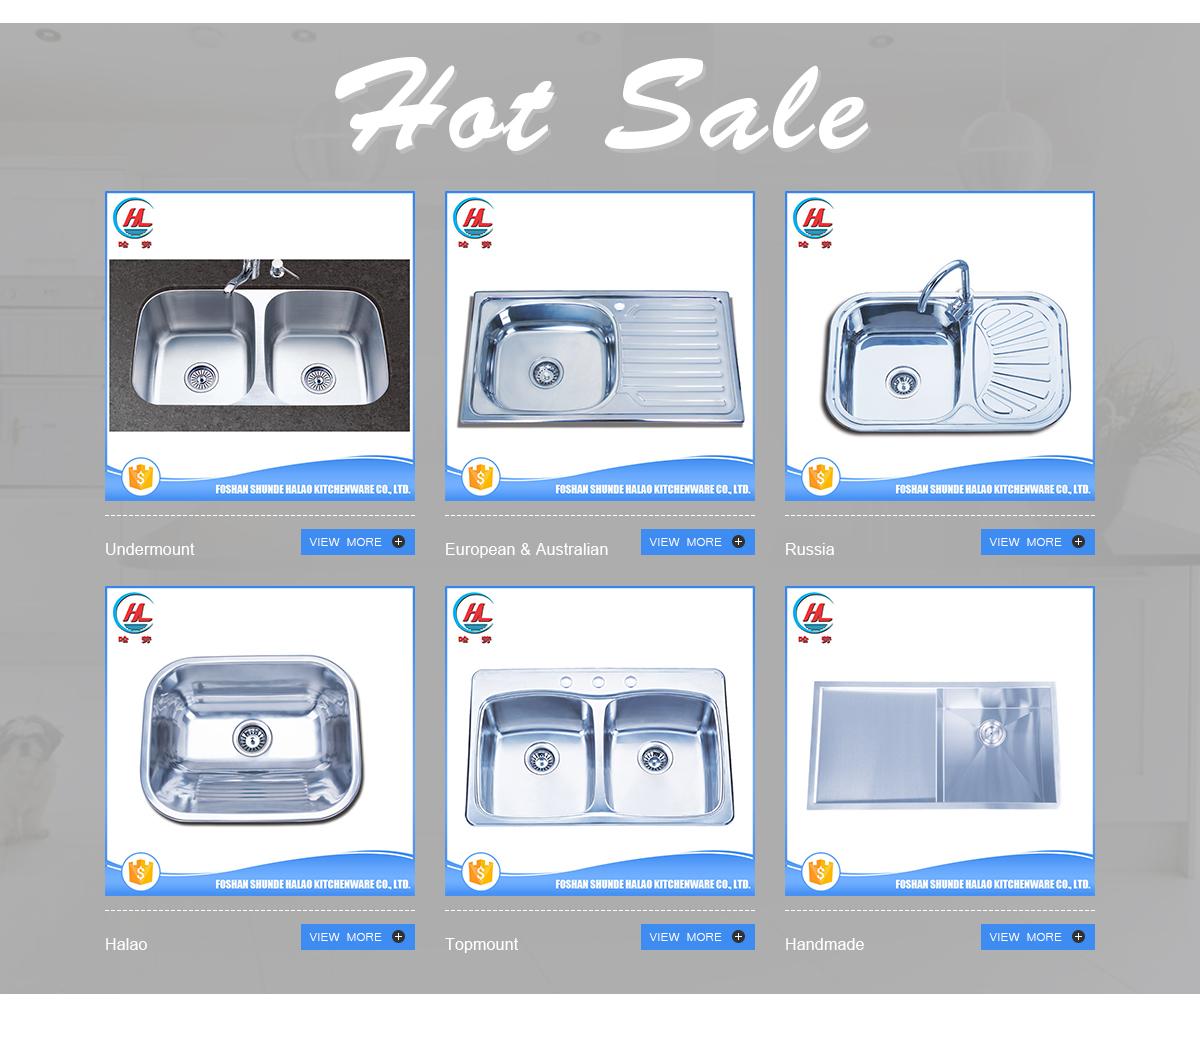 Foshan Shunde Halao Kitchenware Co., Ltd. - Sink, Stainless Sink Steel